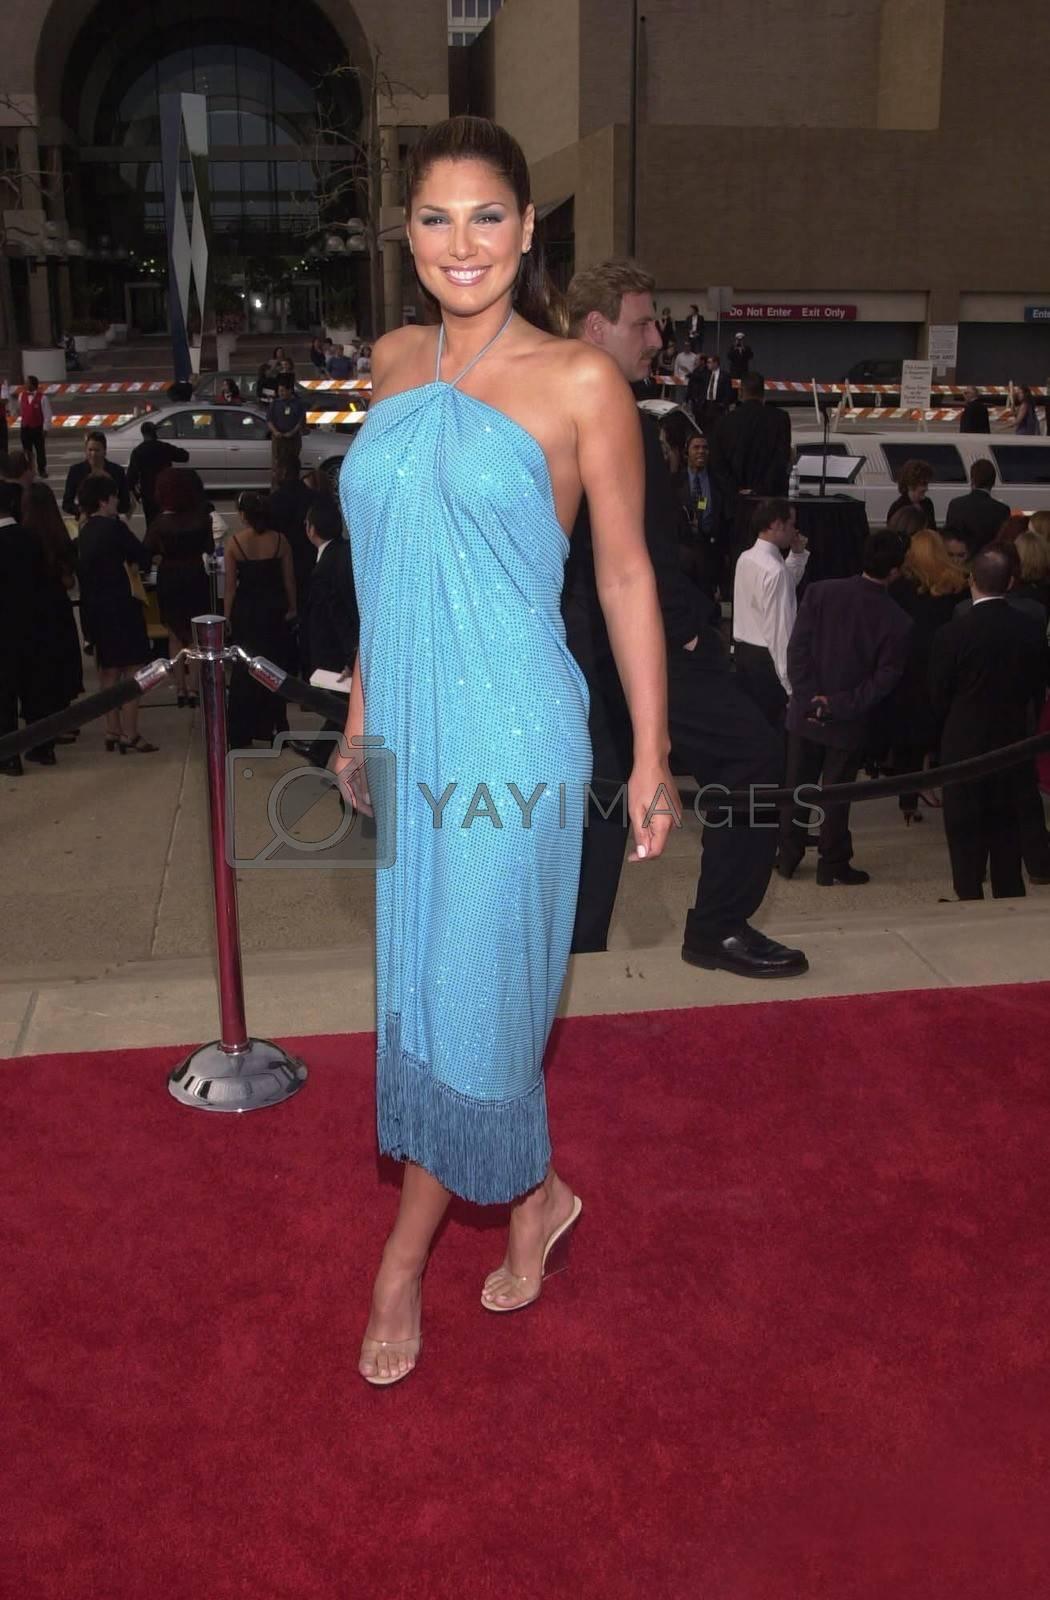 Daisy Fuentes at the 2000 Alma Awards, in Pasadena, 04-16-00